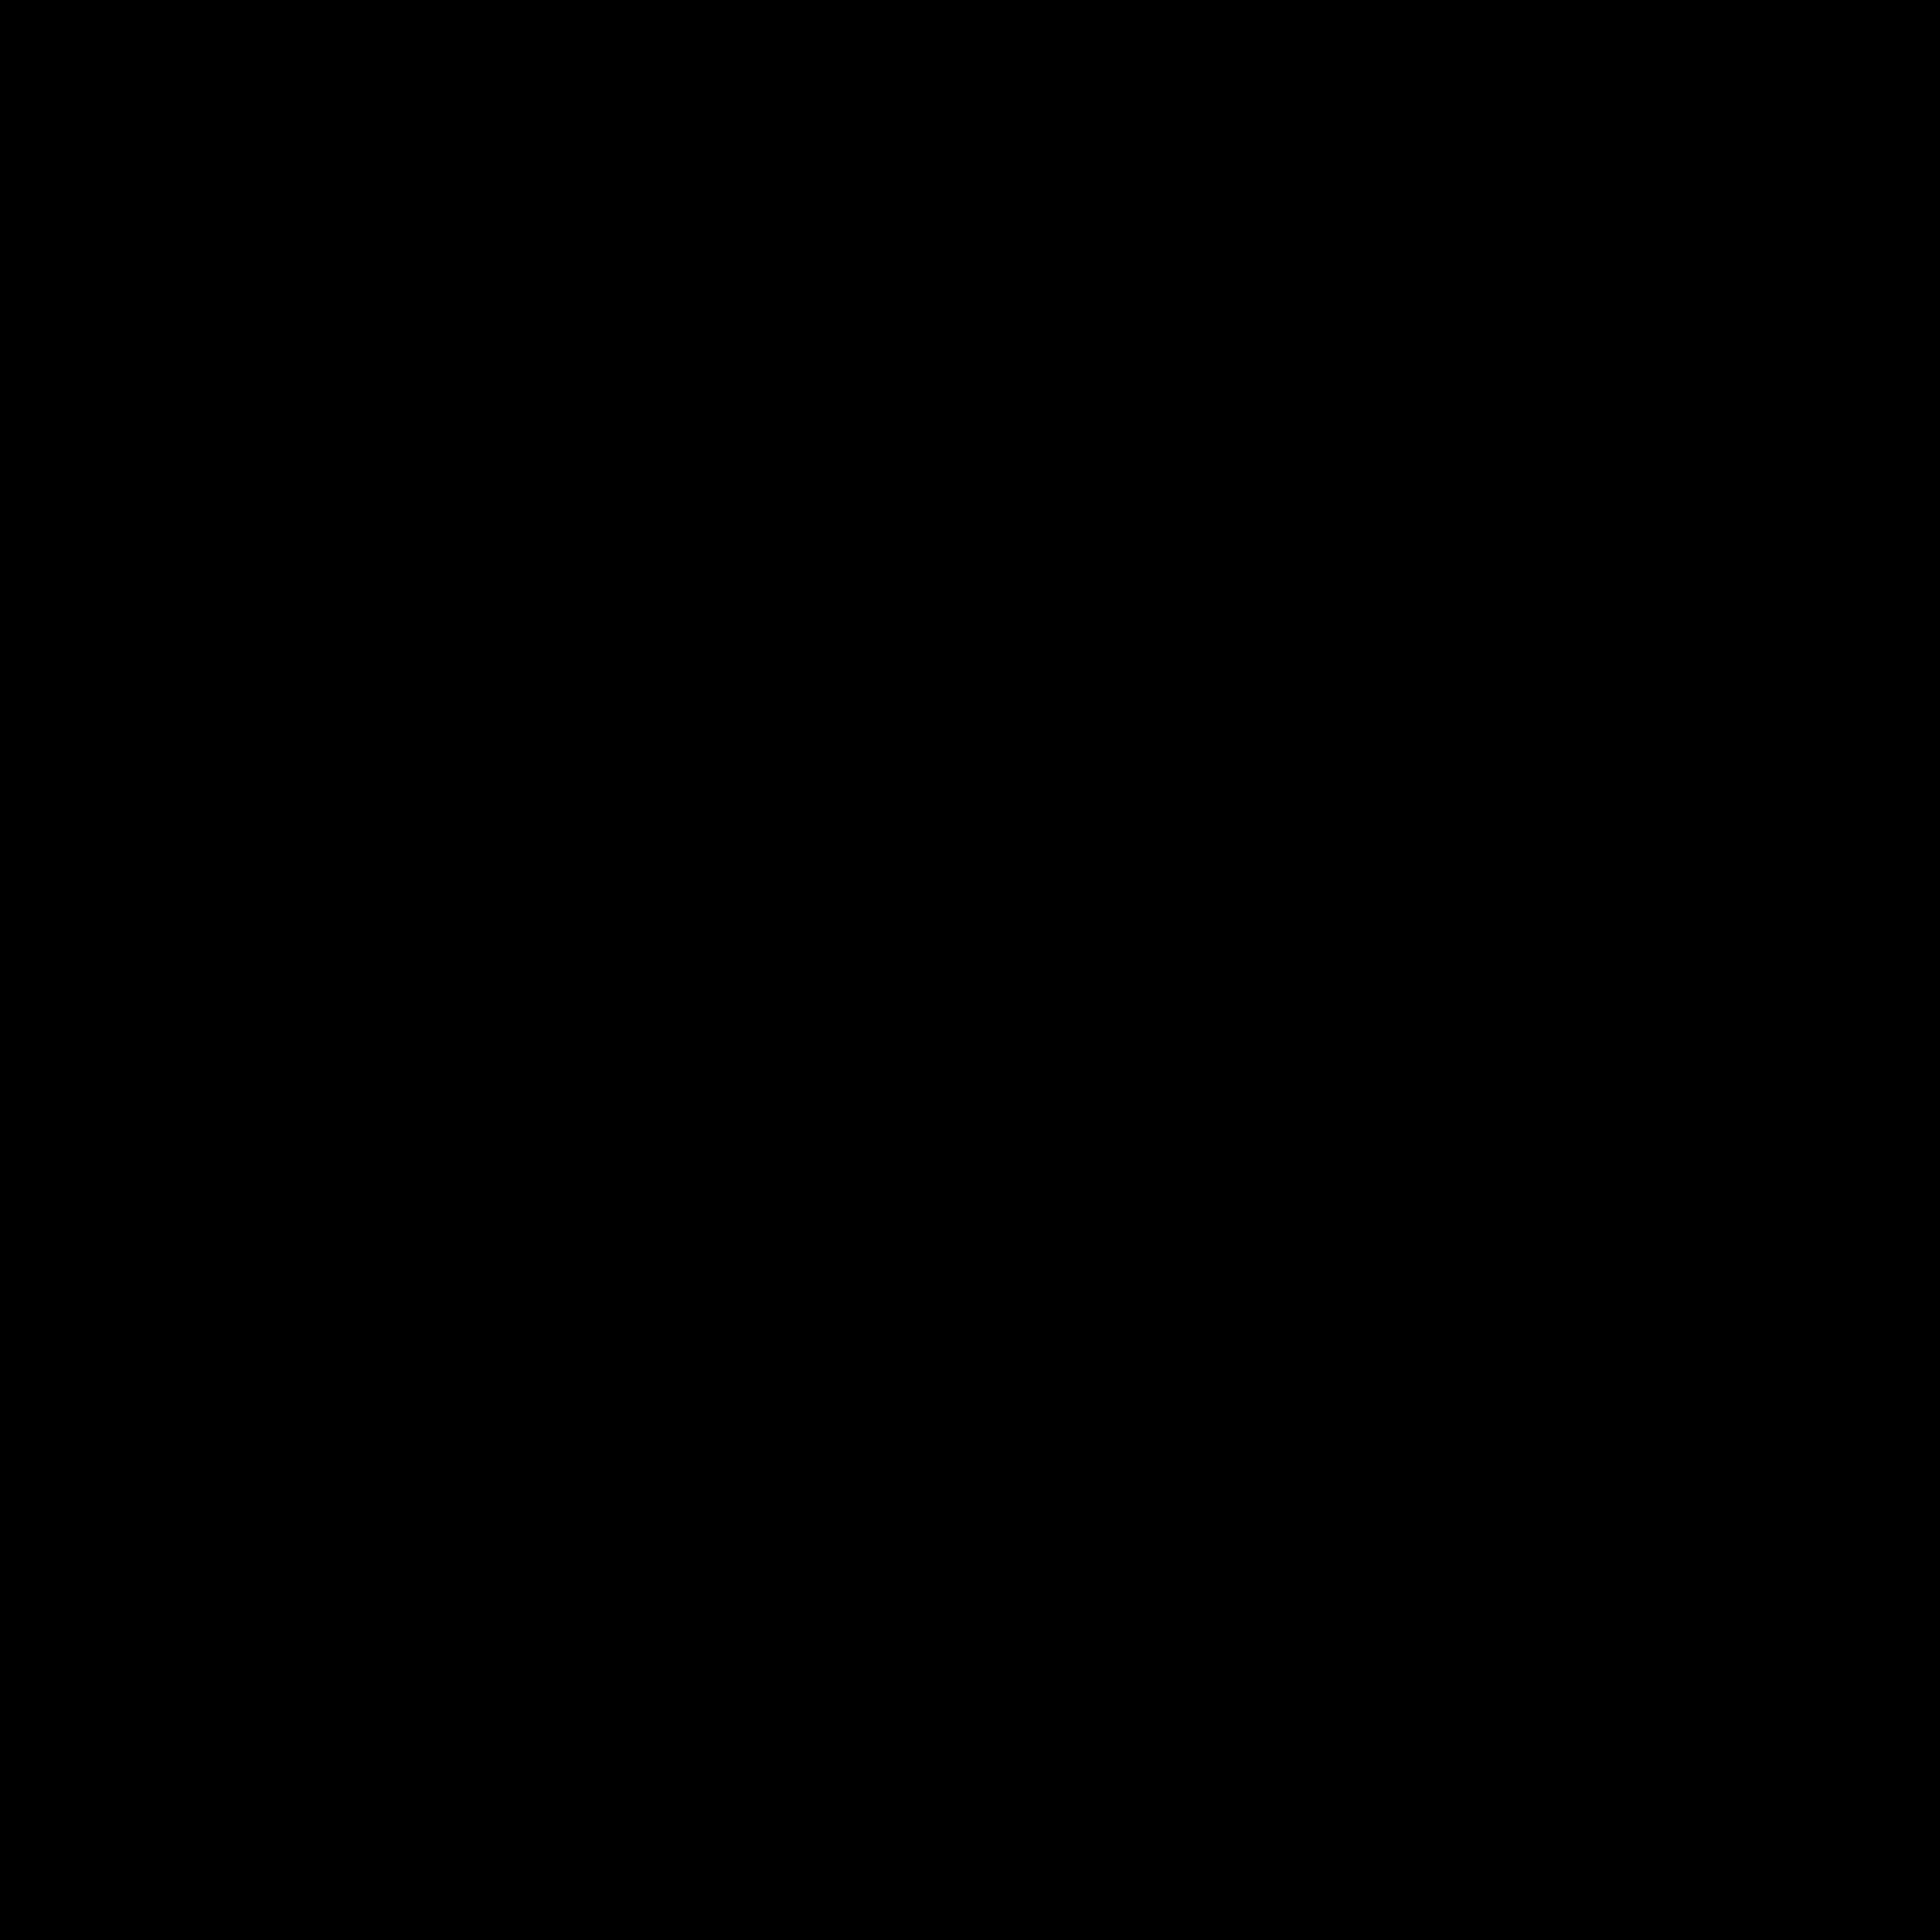 File:Nintendo Switch Logo.svg - Wikimedia Commons vector free